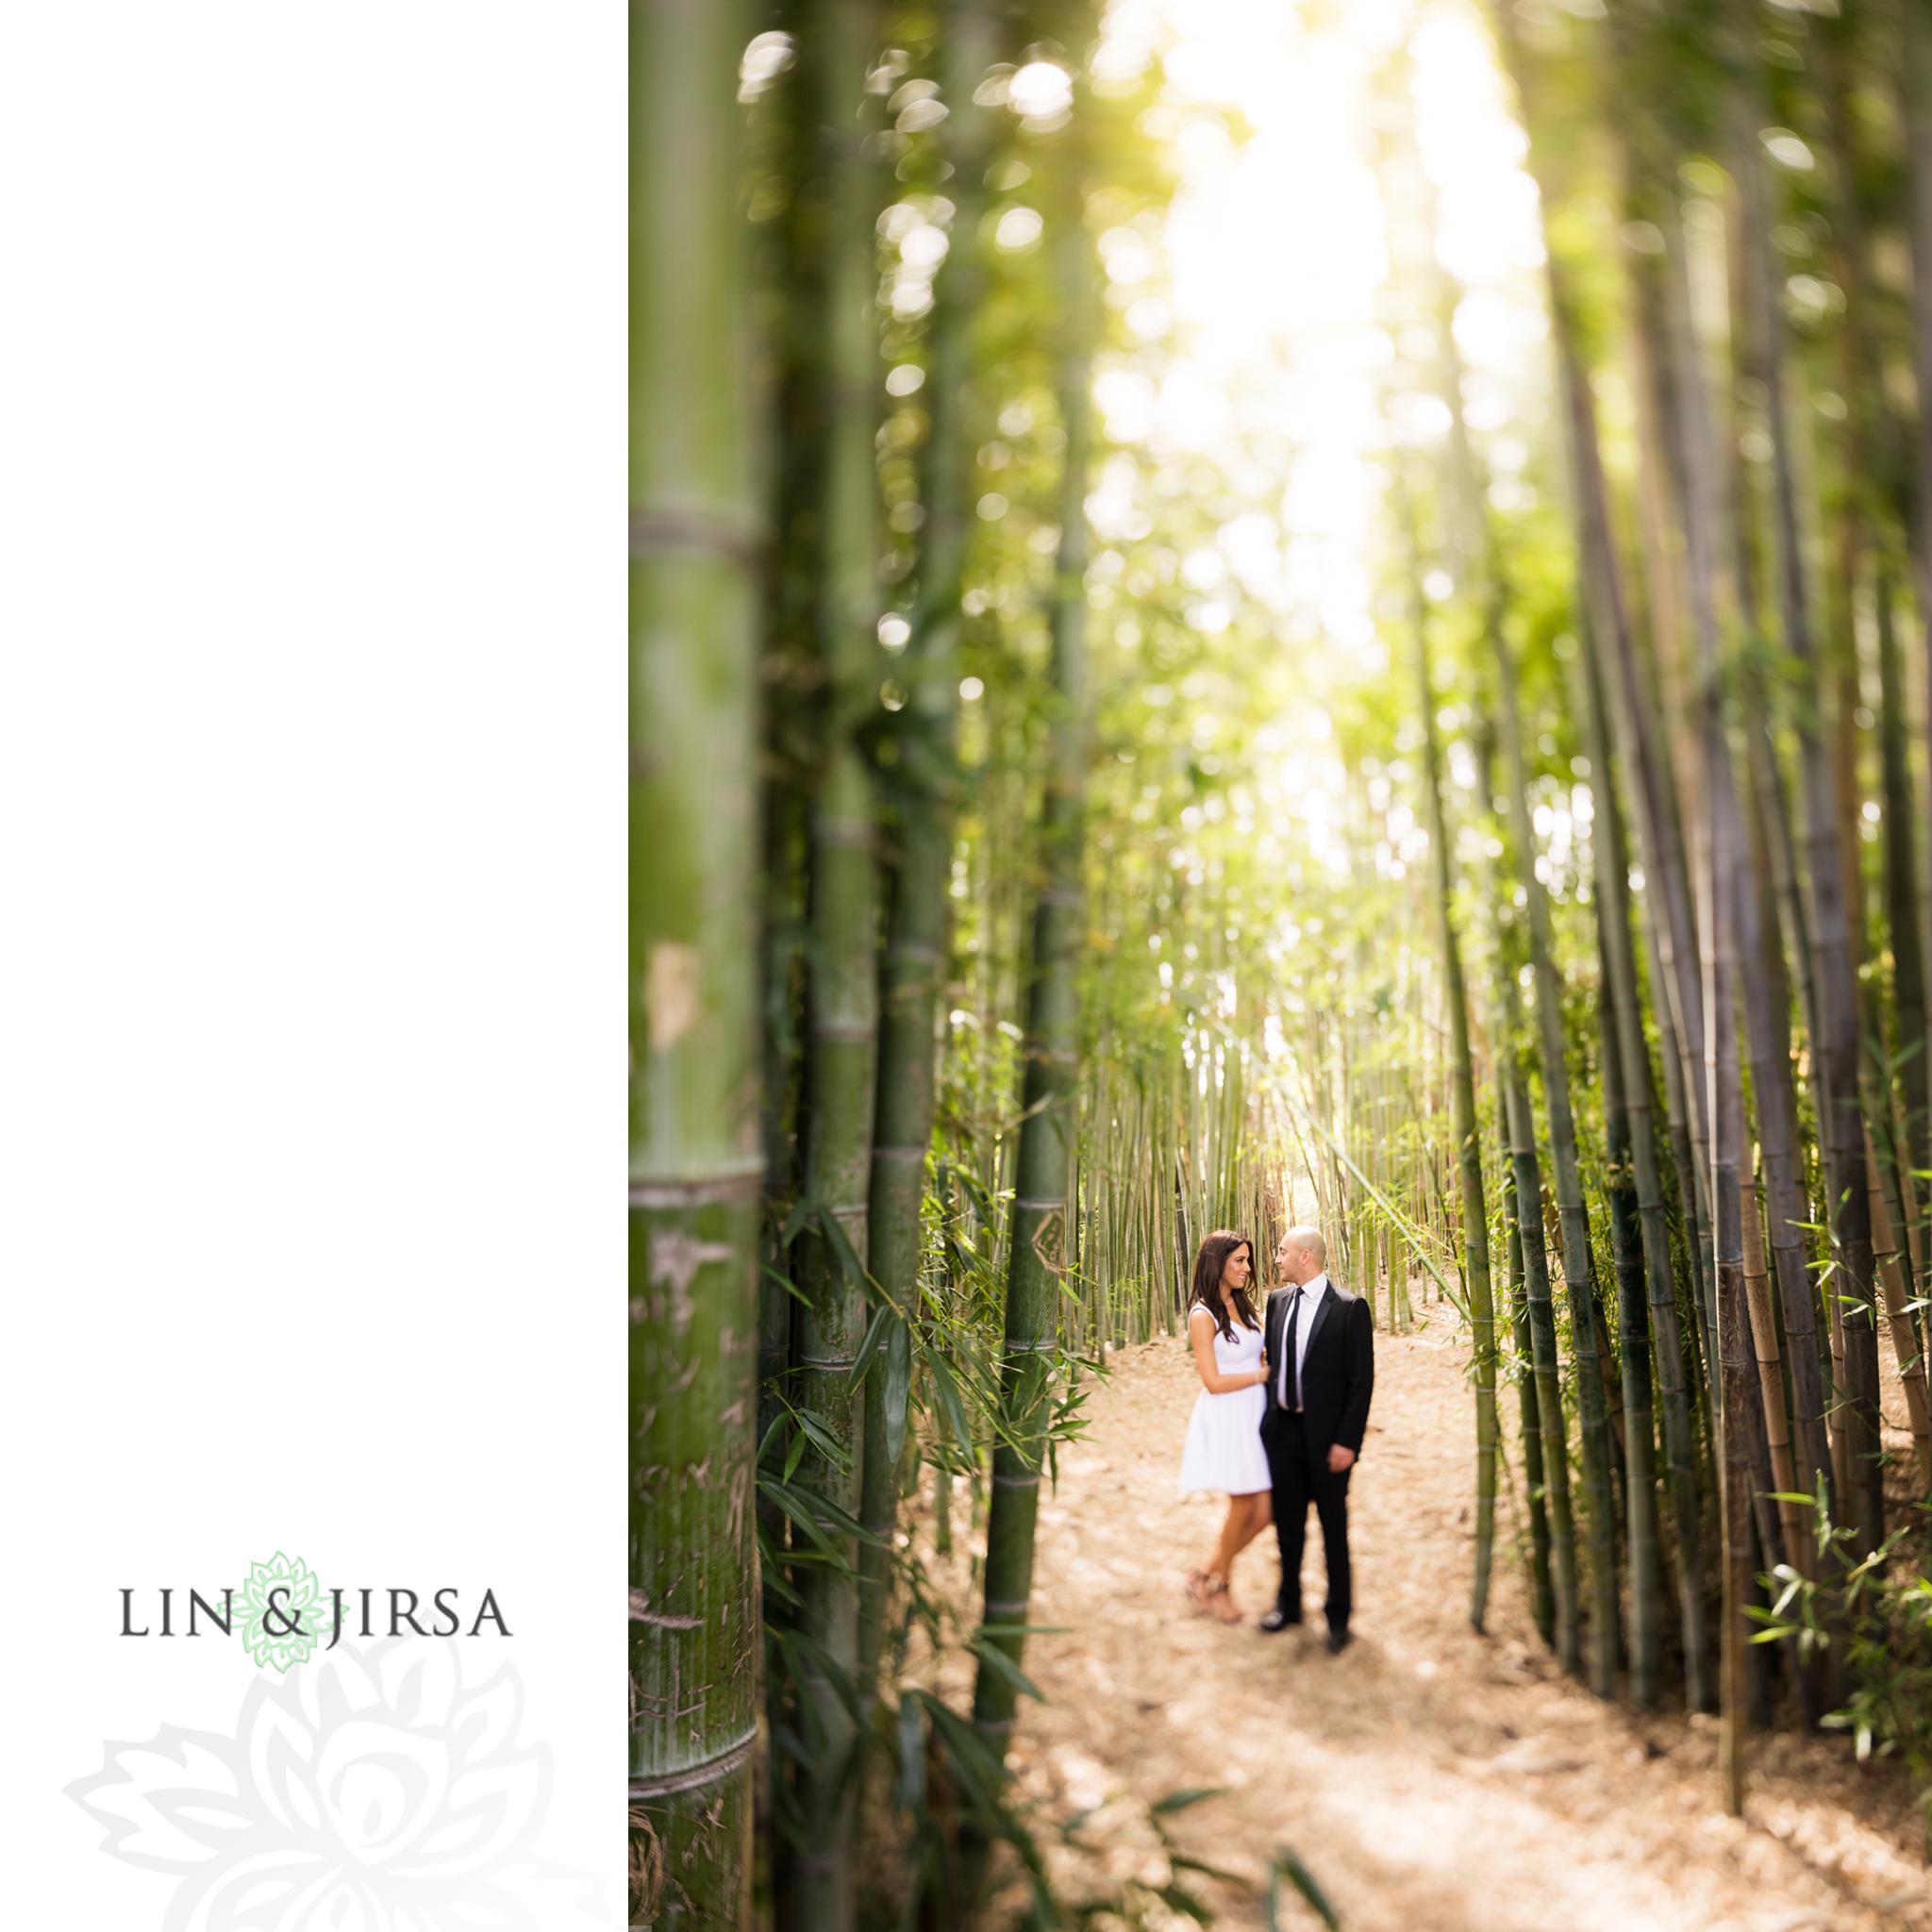 01-Los-angeles-arboretum-engagement-photography